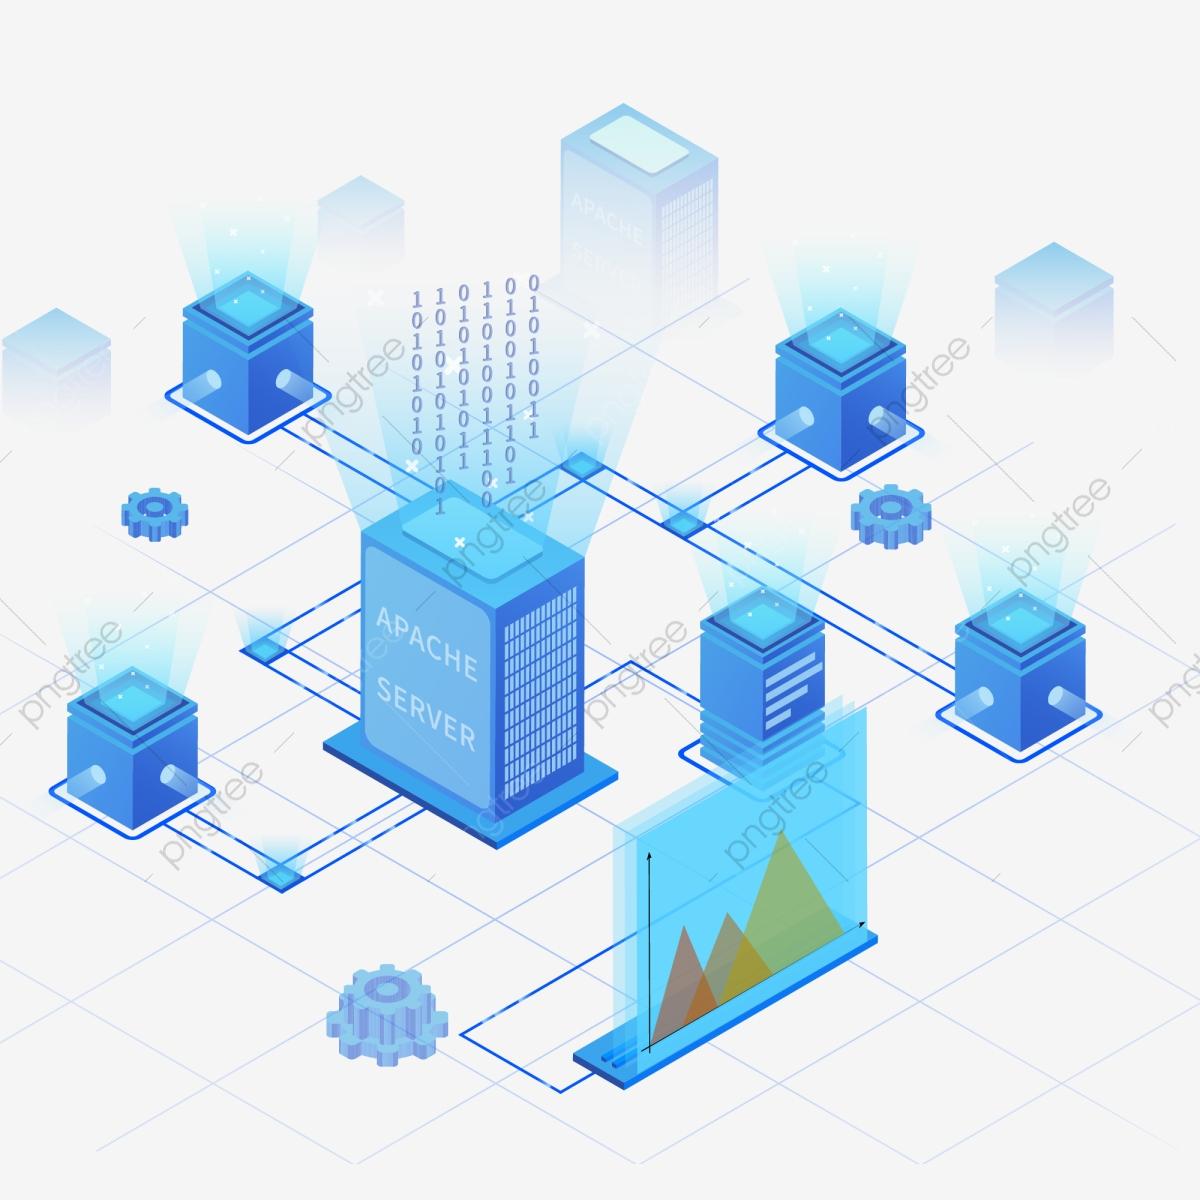 Base De Datos Almacenamiento Servidor Internet Tecnología 2 5d, 2.5d.